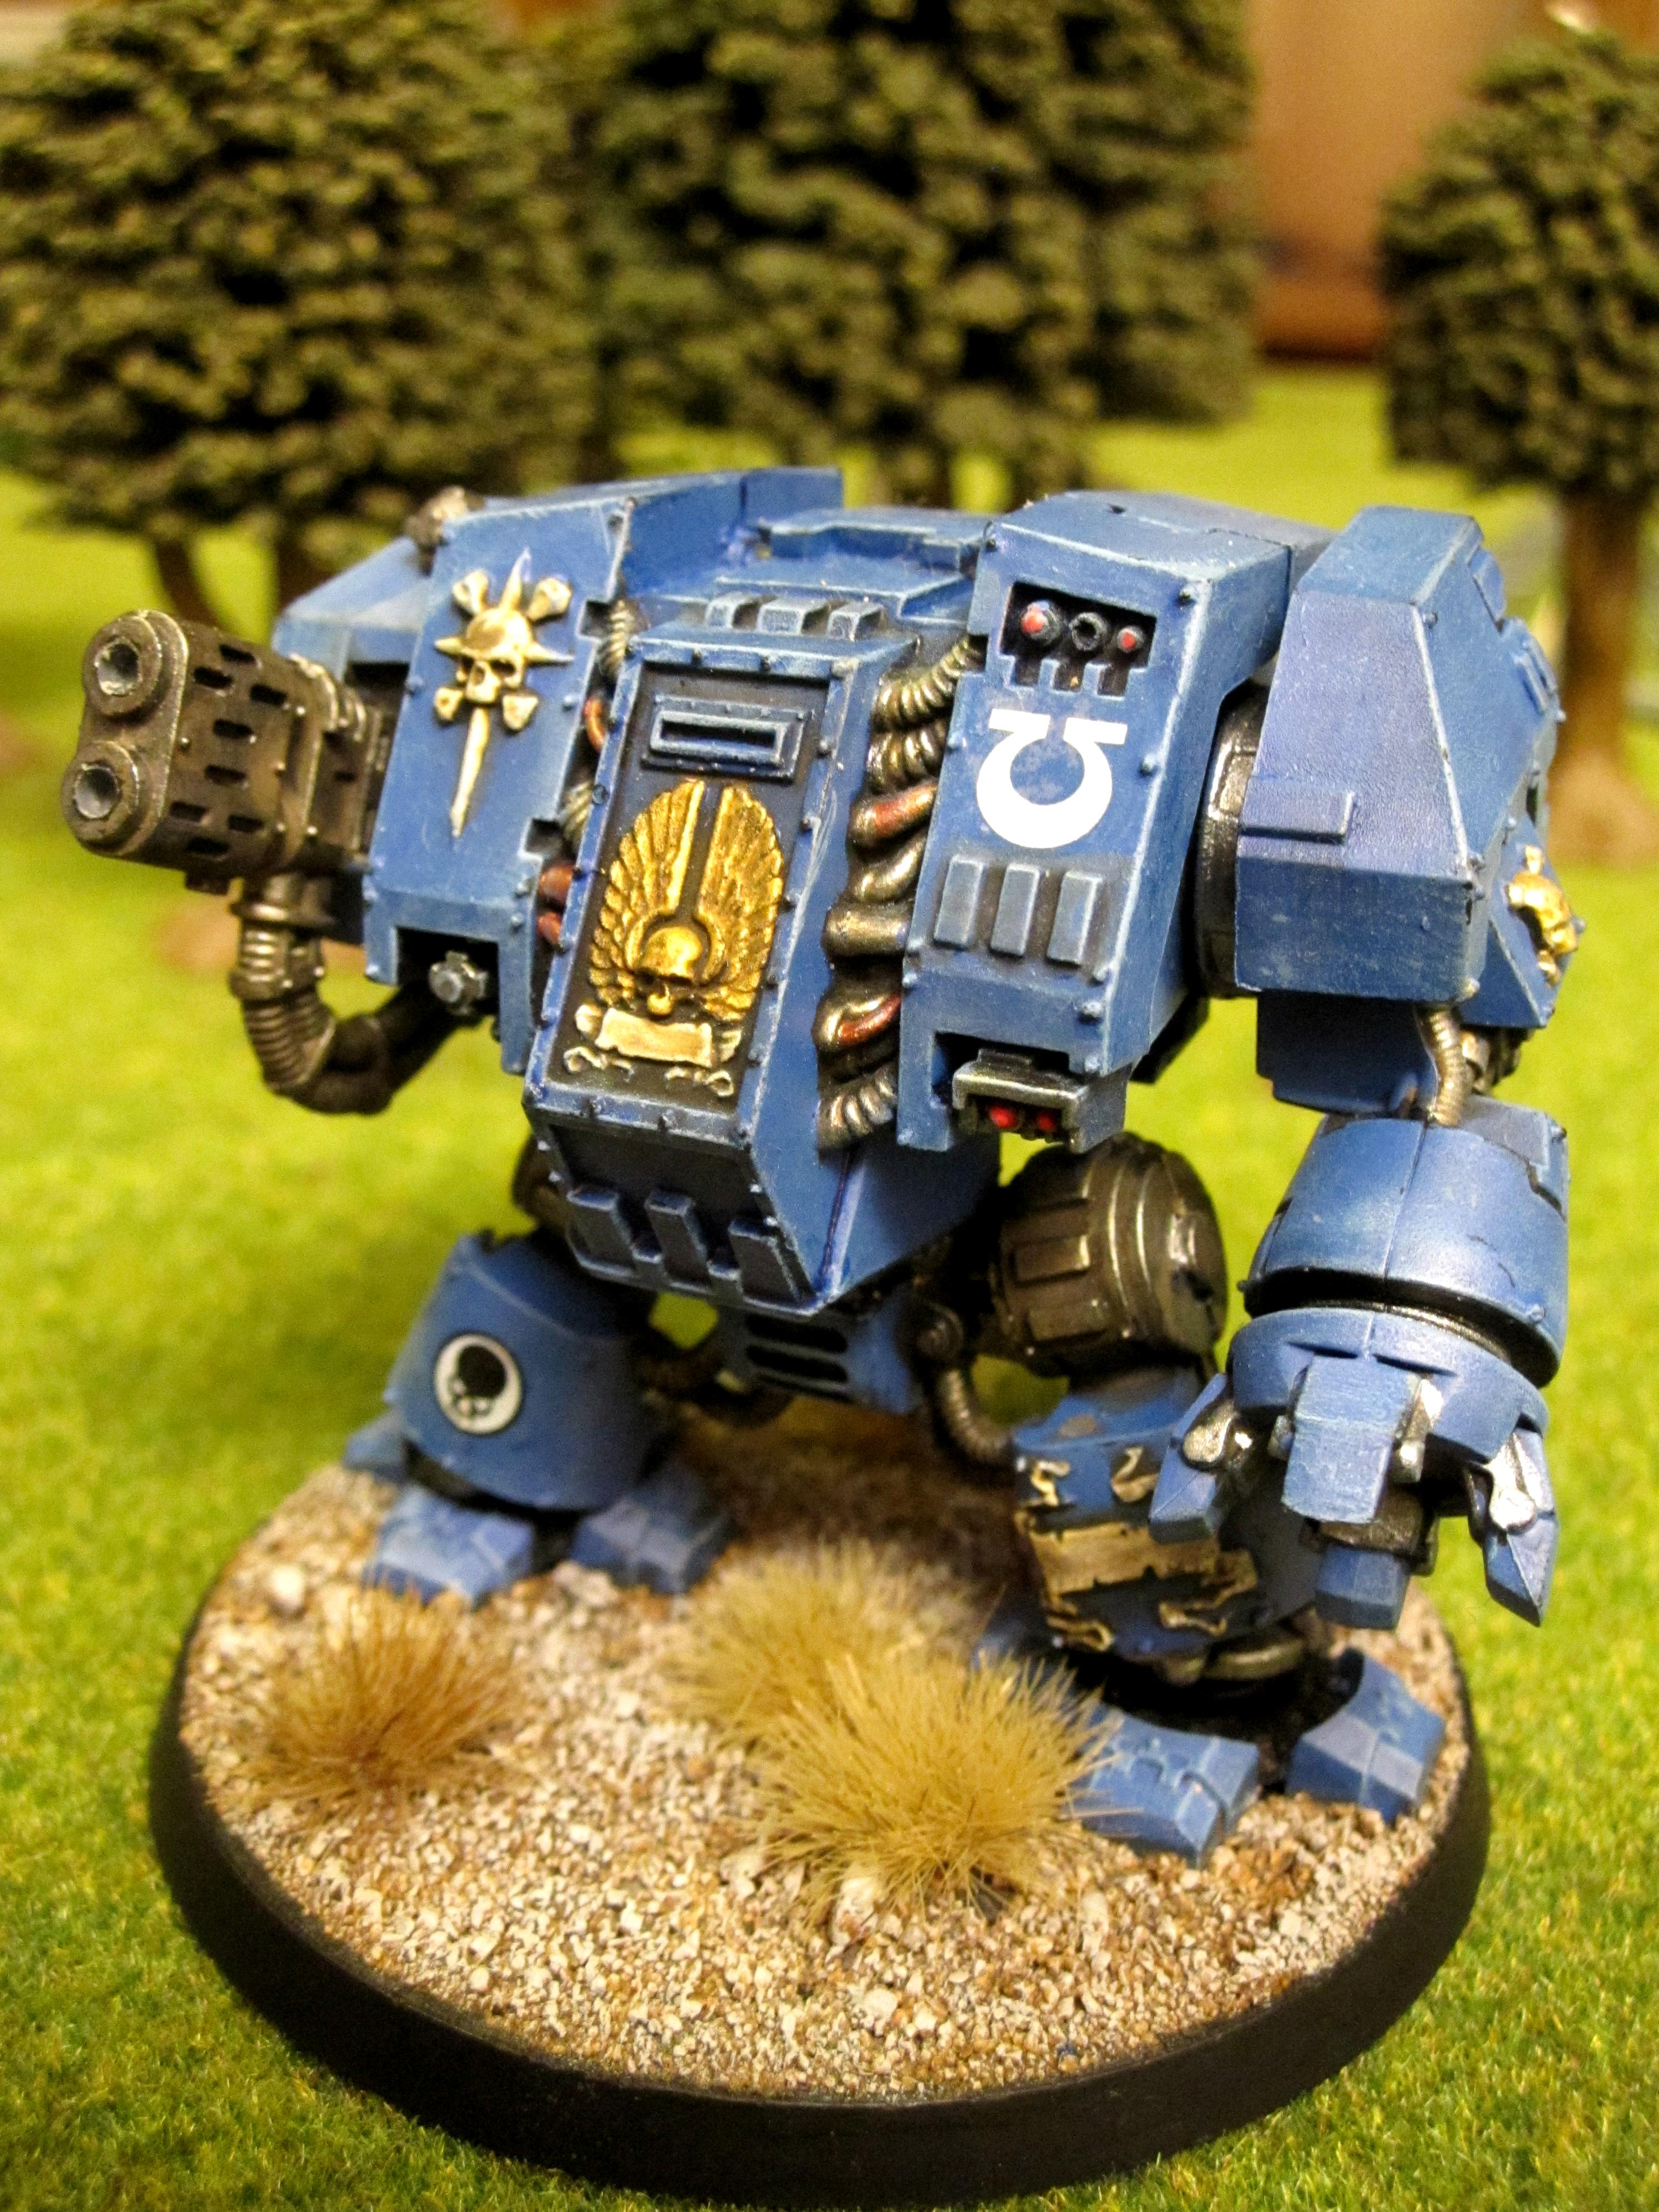 Dreadnought, Elites, Space Marines, Ultramarines, Warhammer 40,000